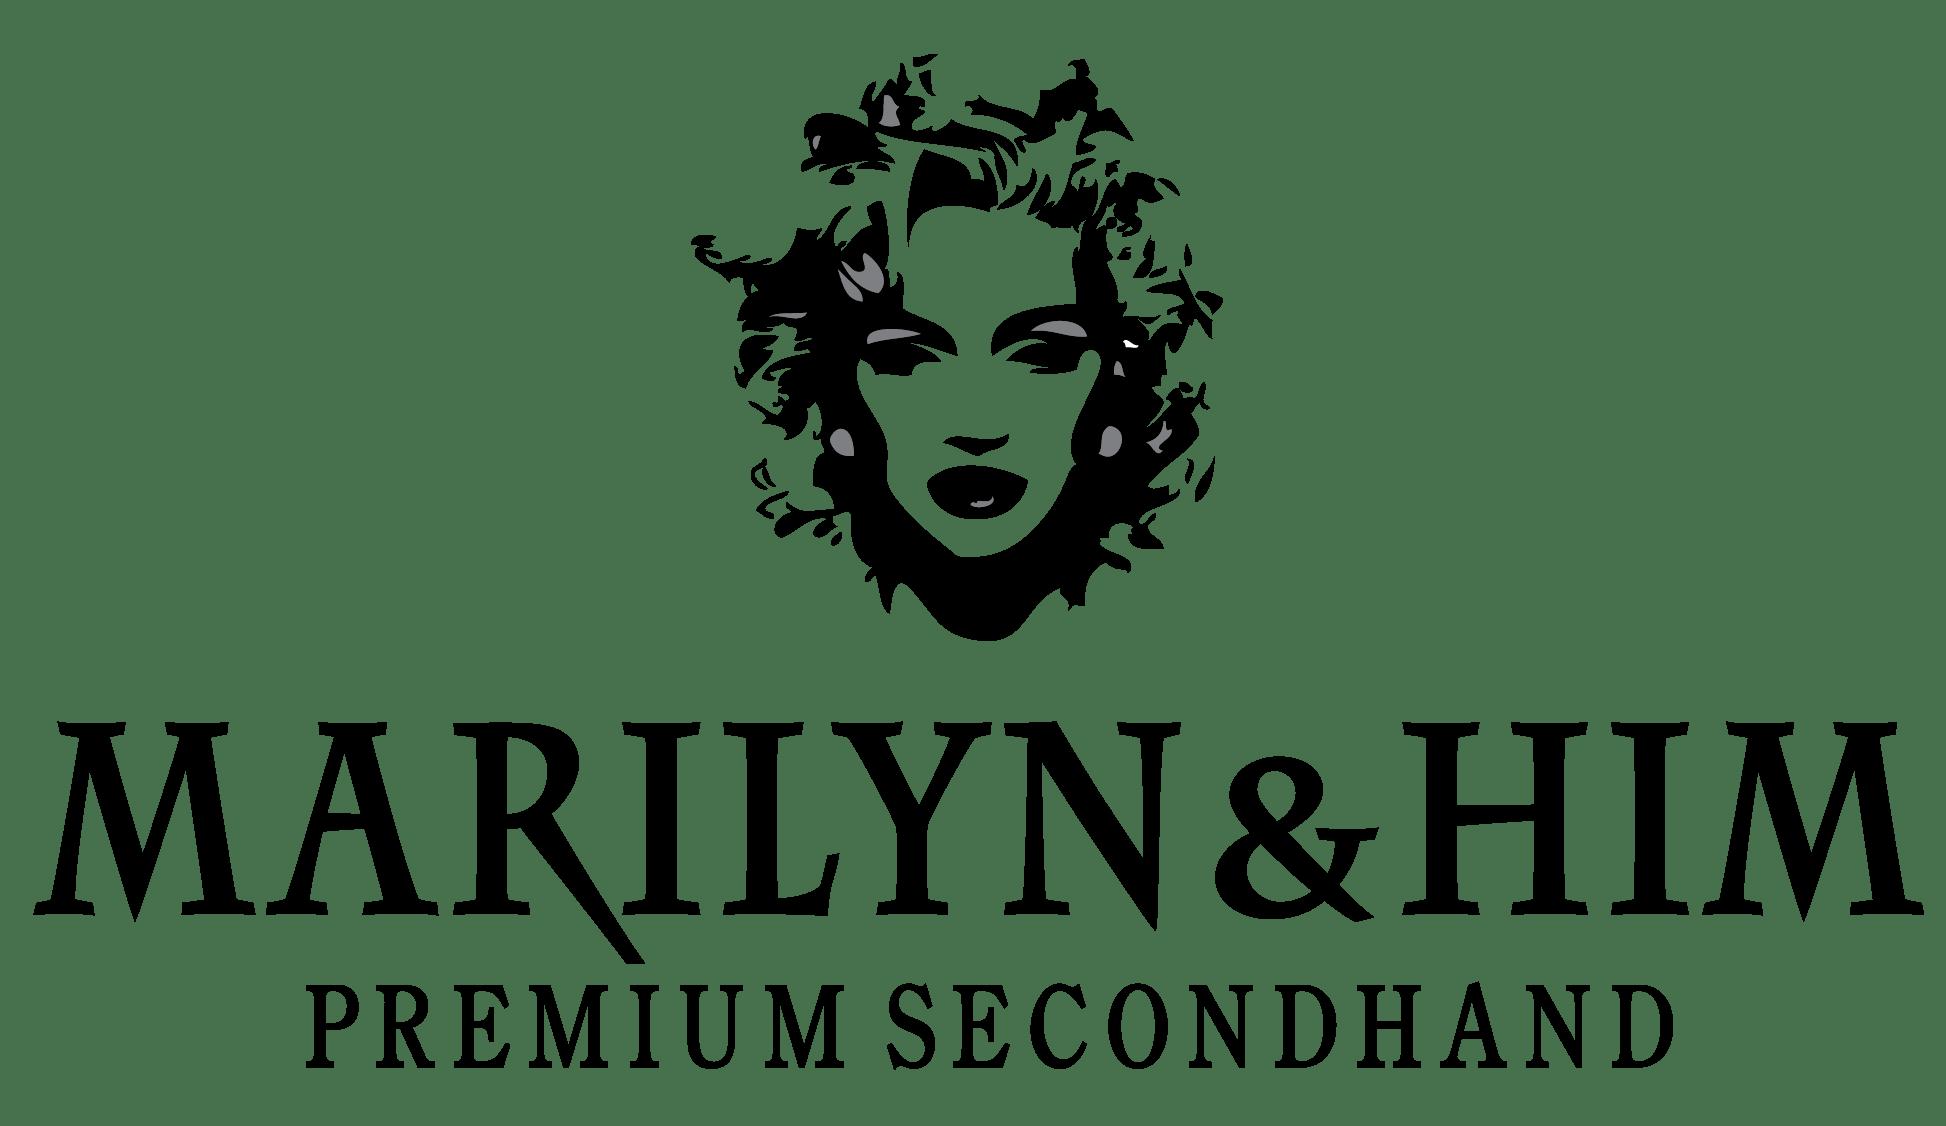 Marilynandhim.com